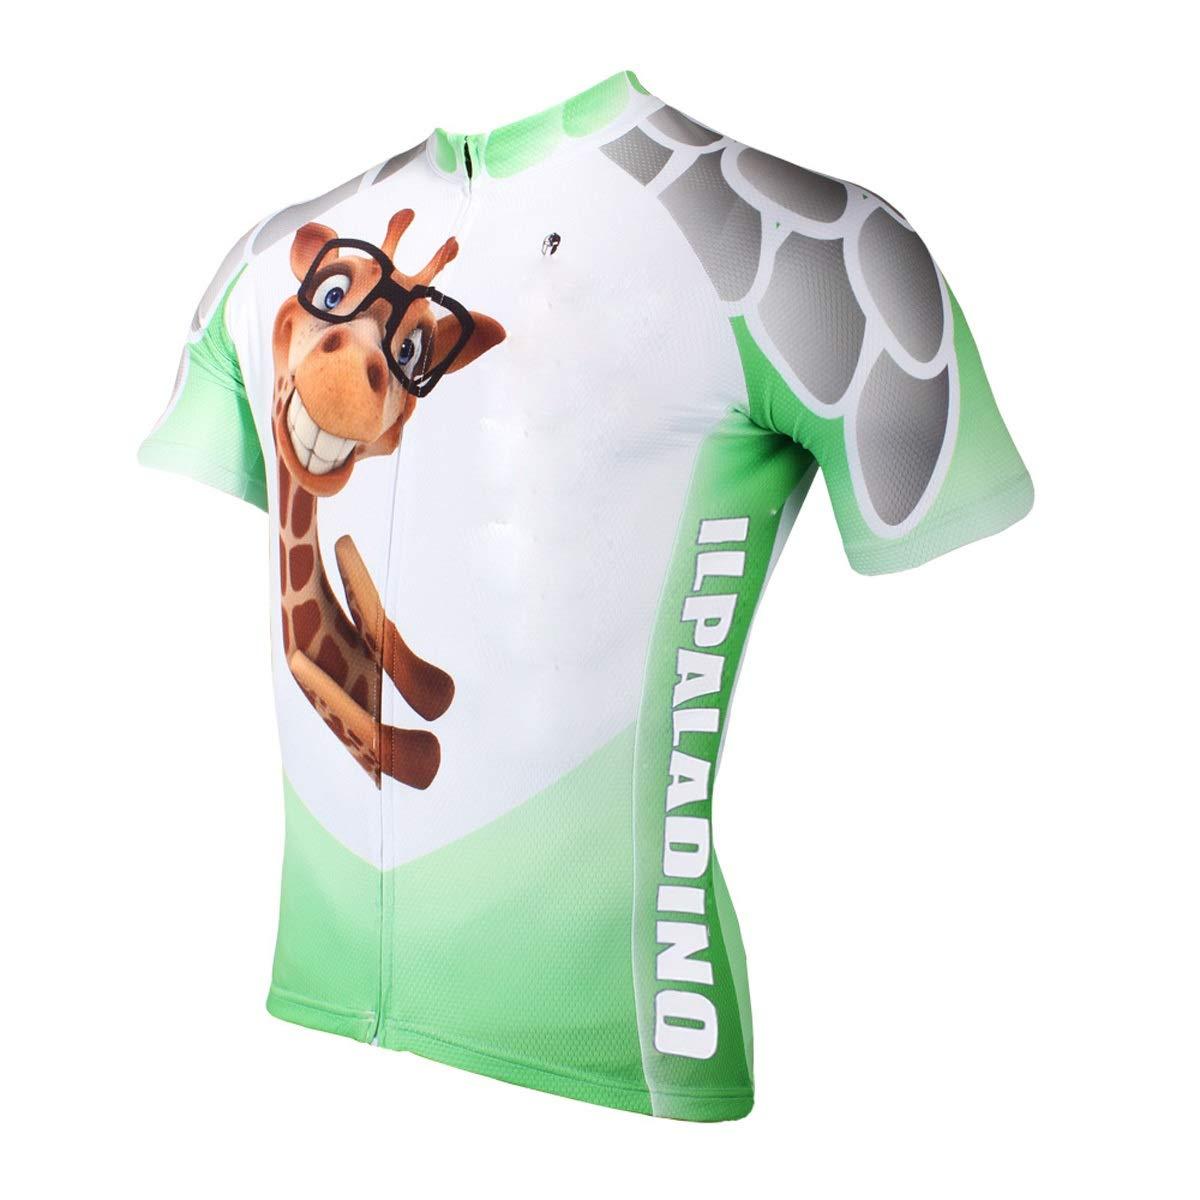 Bike Jersey Cute Summer Kurzarm-Trikotanzug Weibliche Mountainbike-Trikot Männer Fahrrad Reitanzug Fahrradtrikot LPLHJD